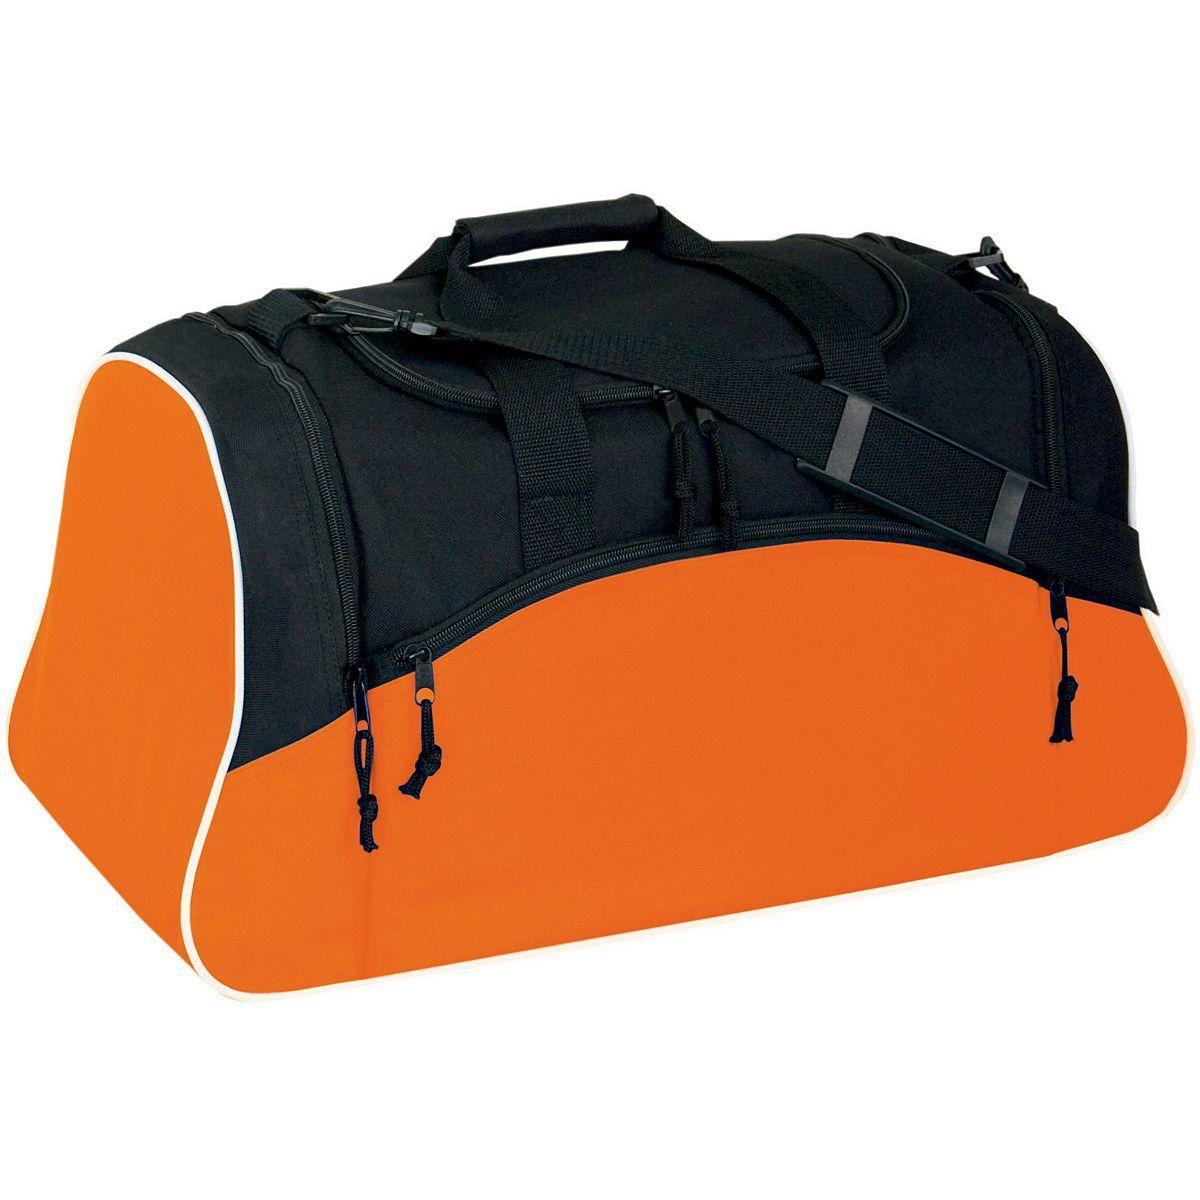 Training Bag - ORANGE/BLACK/WHITE